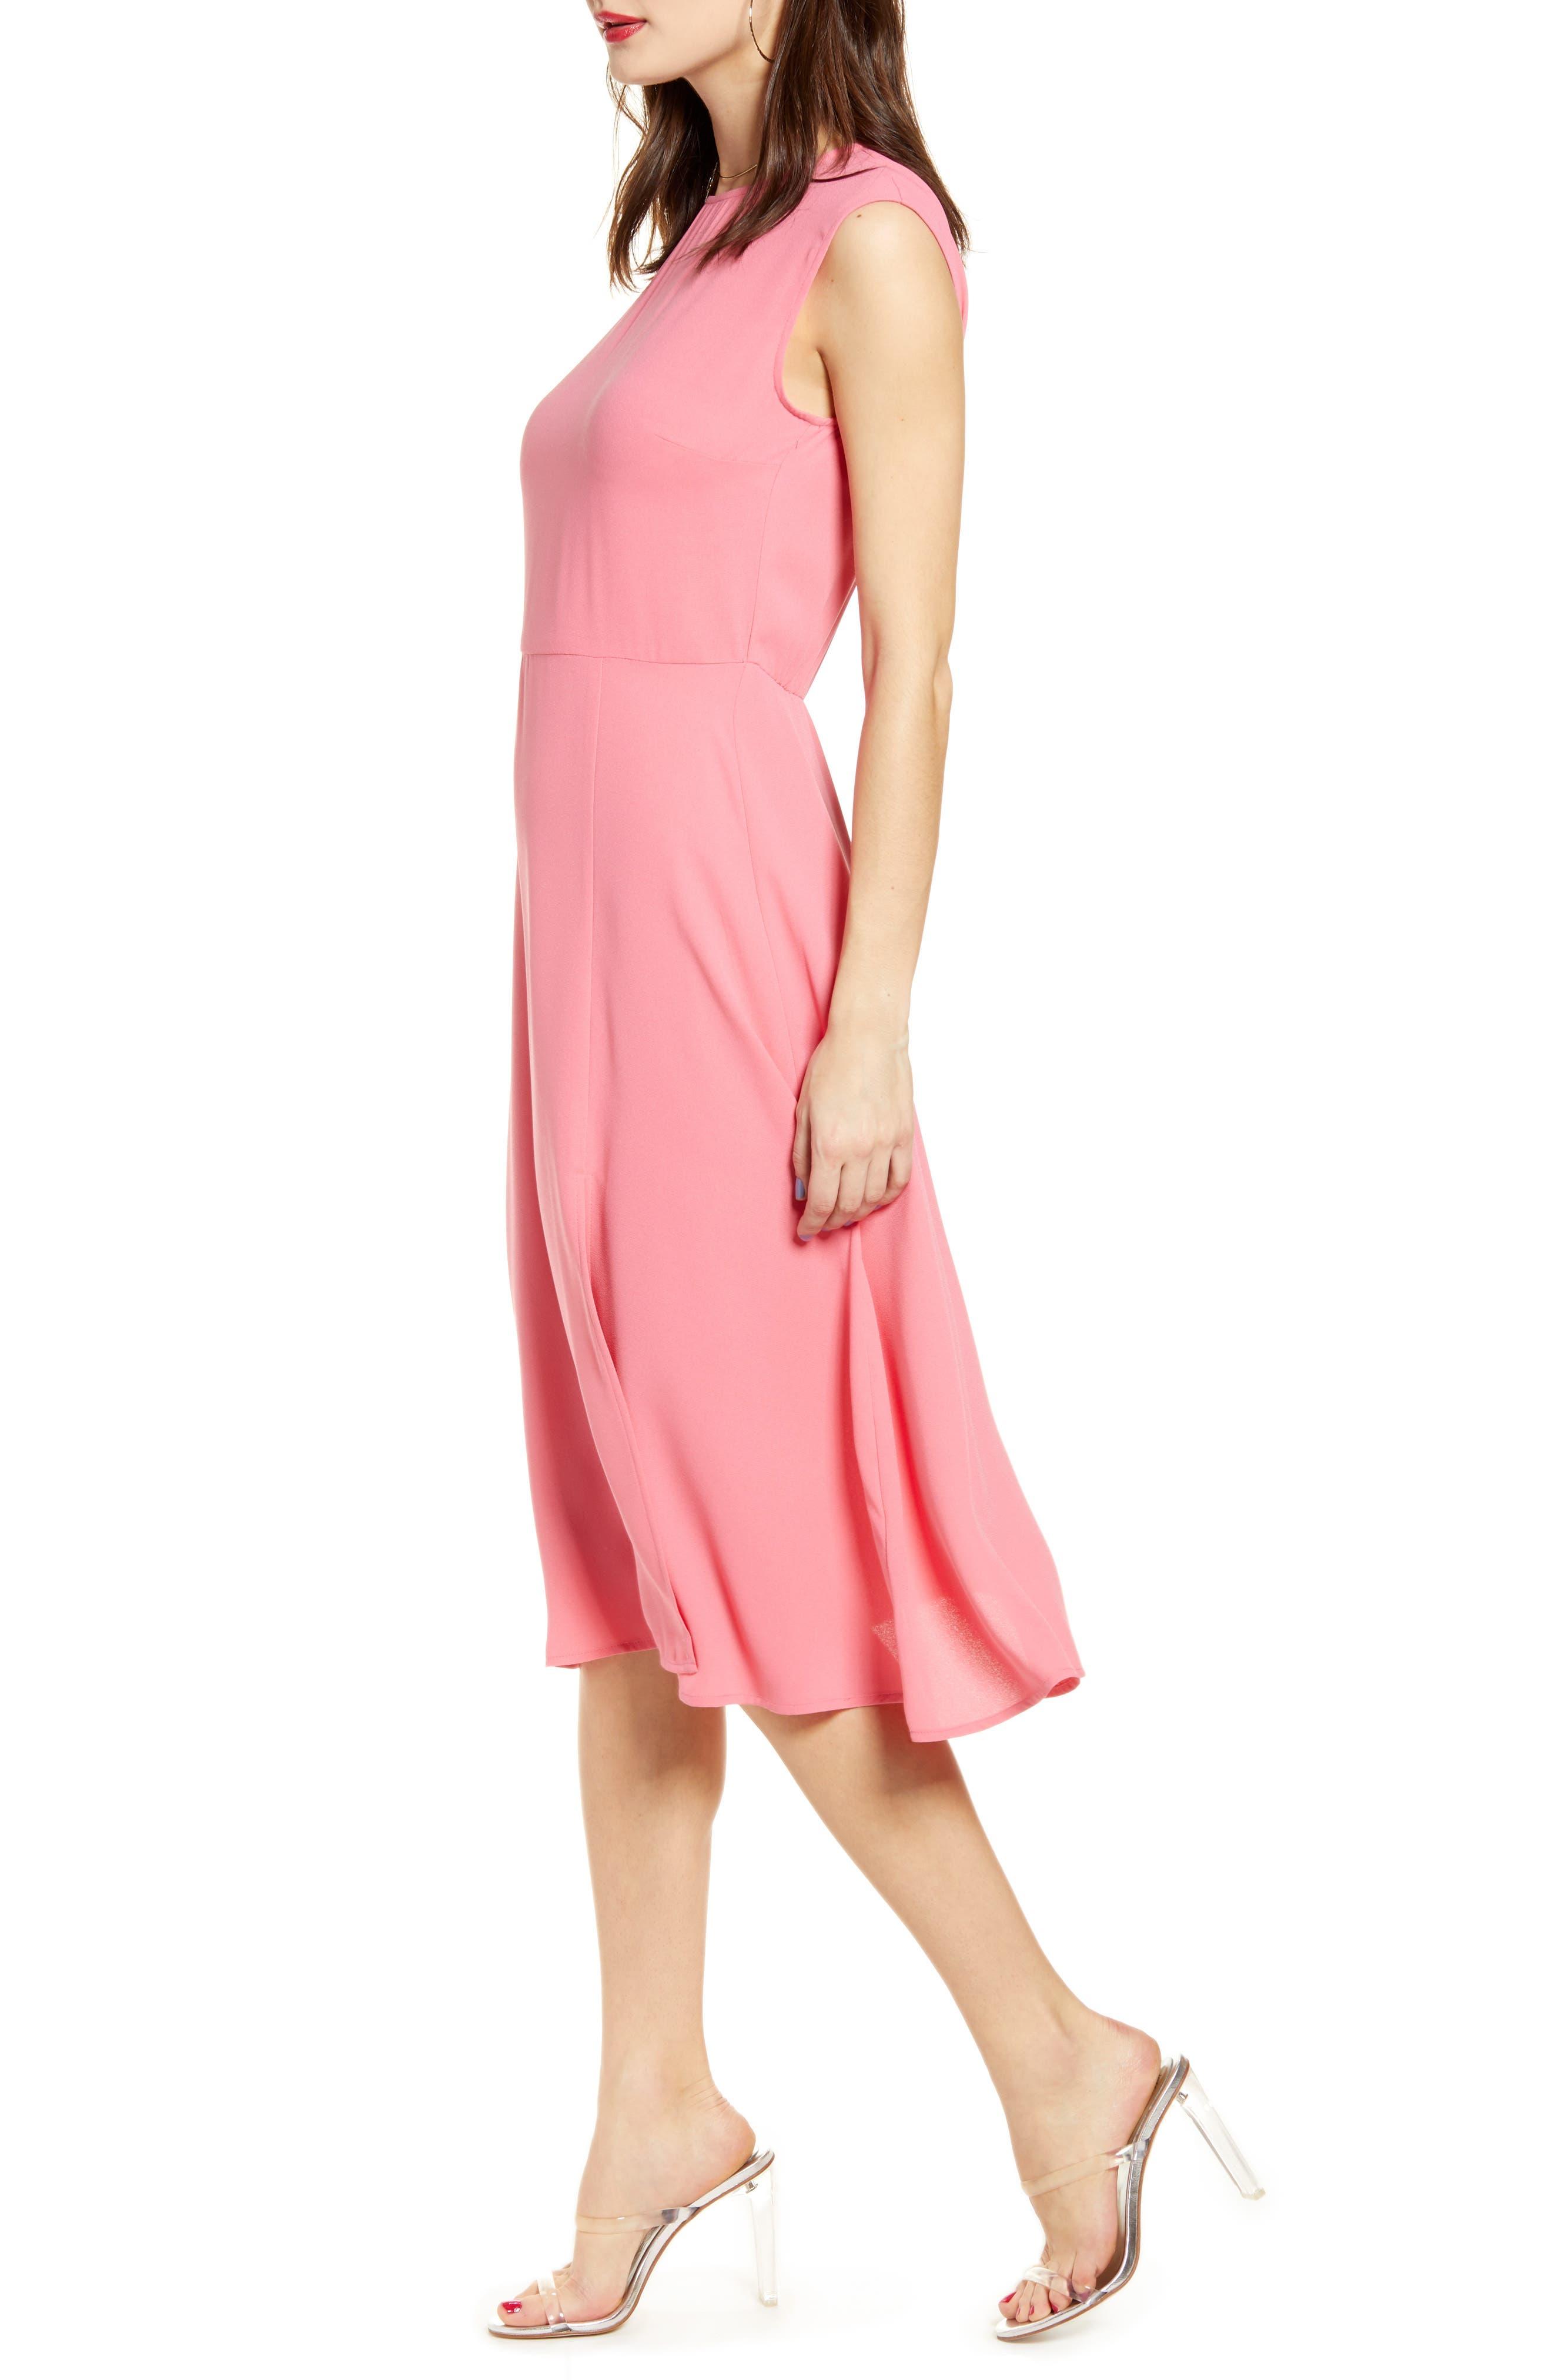 LEITH, Chic Midi Dress, Alternate thumbnail 4, color, PINK LEMONADE